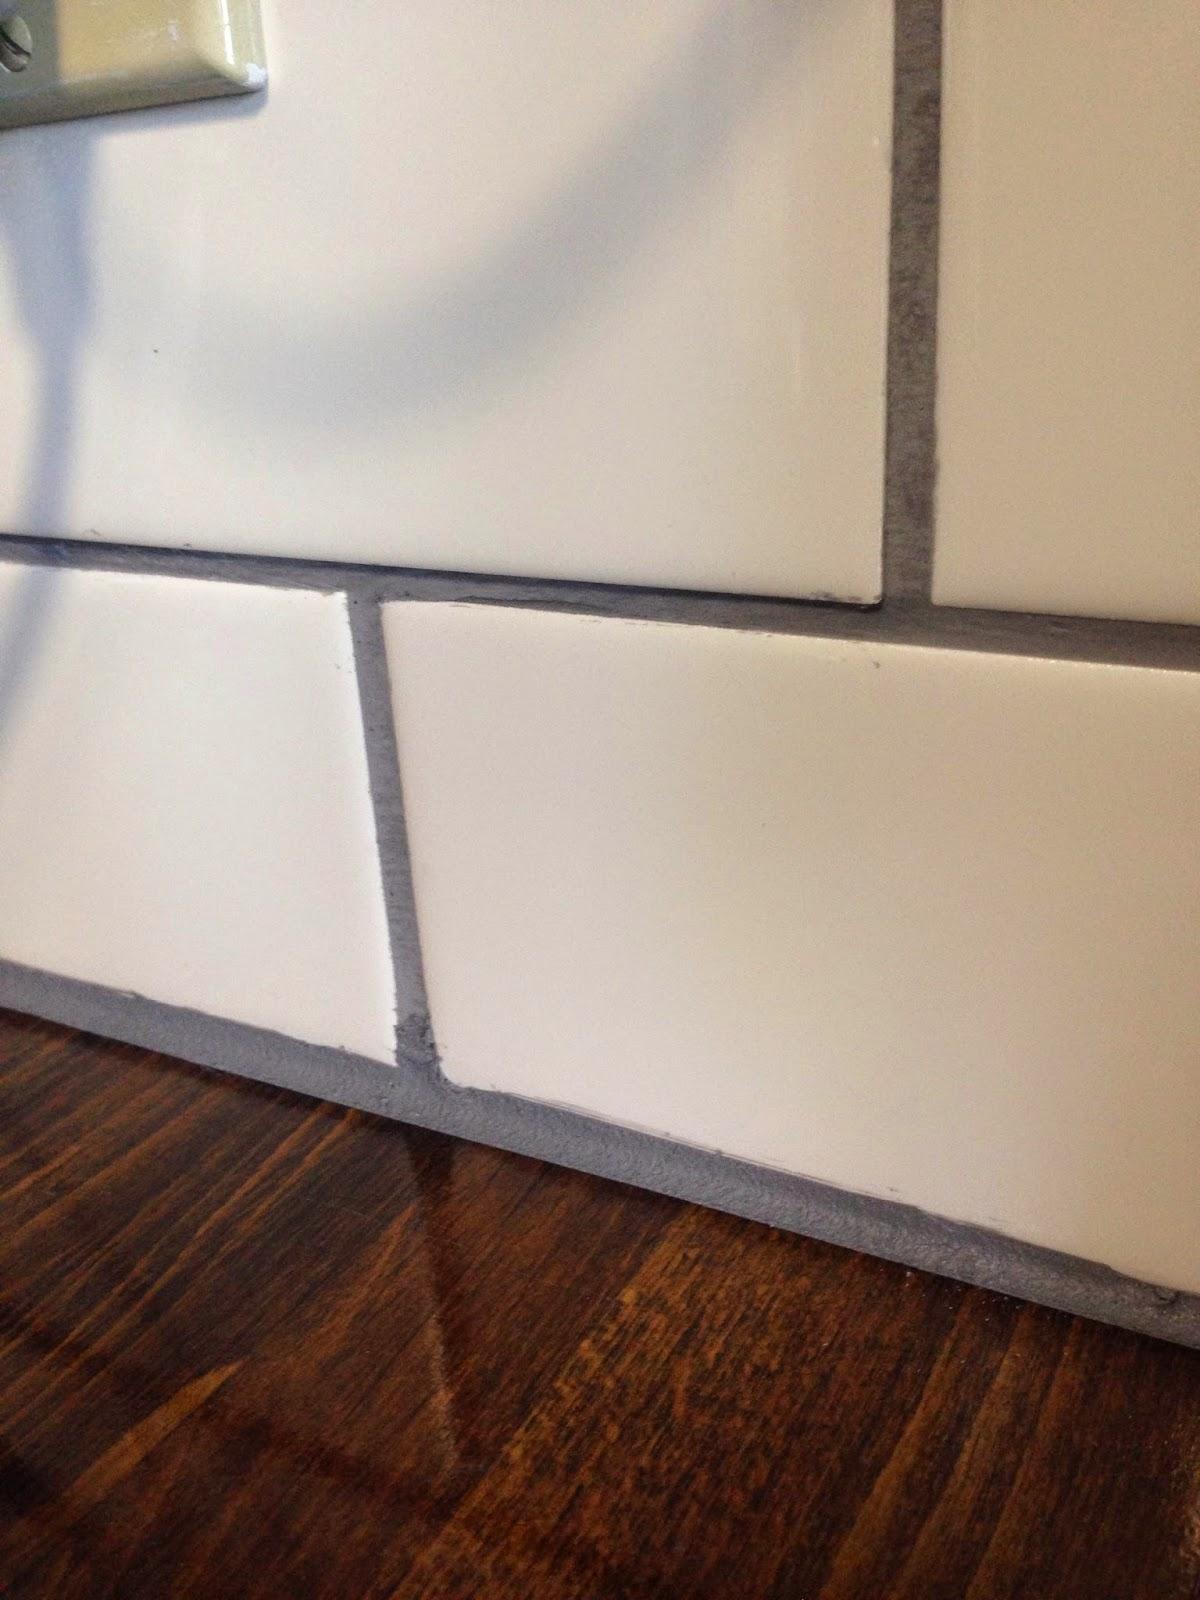 Caulking tile backsplash